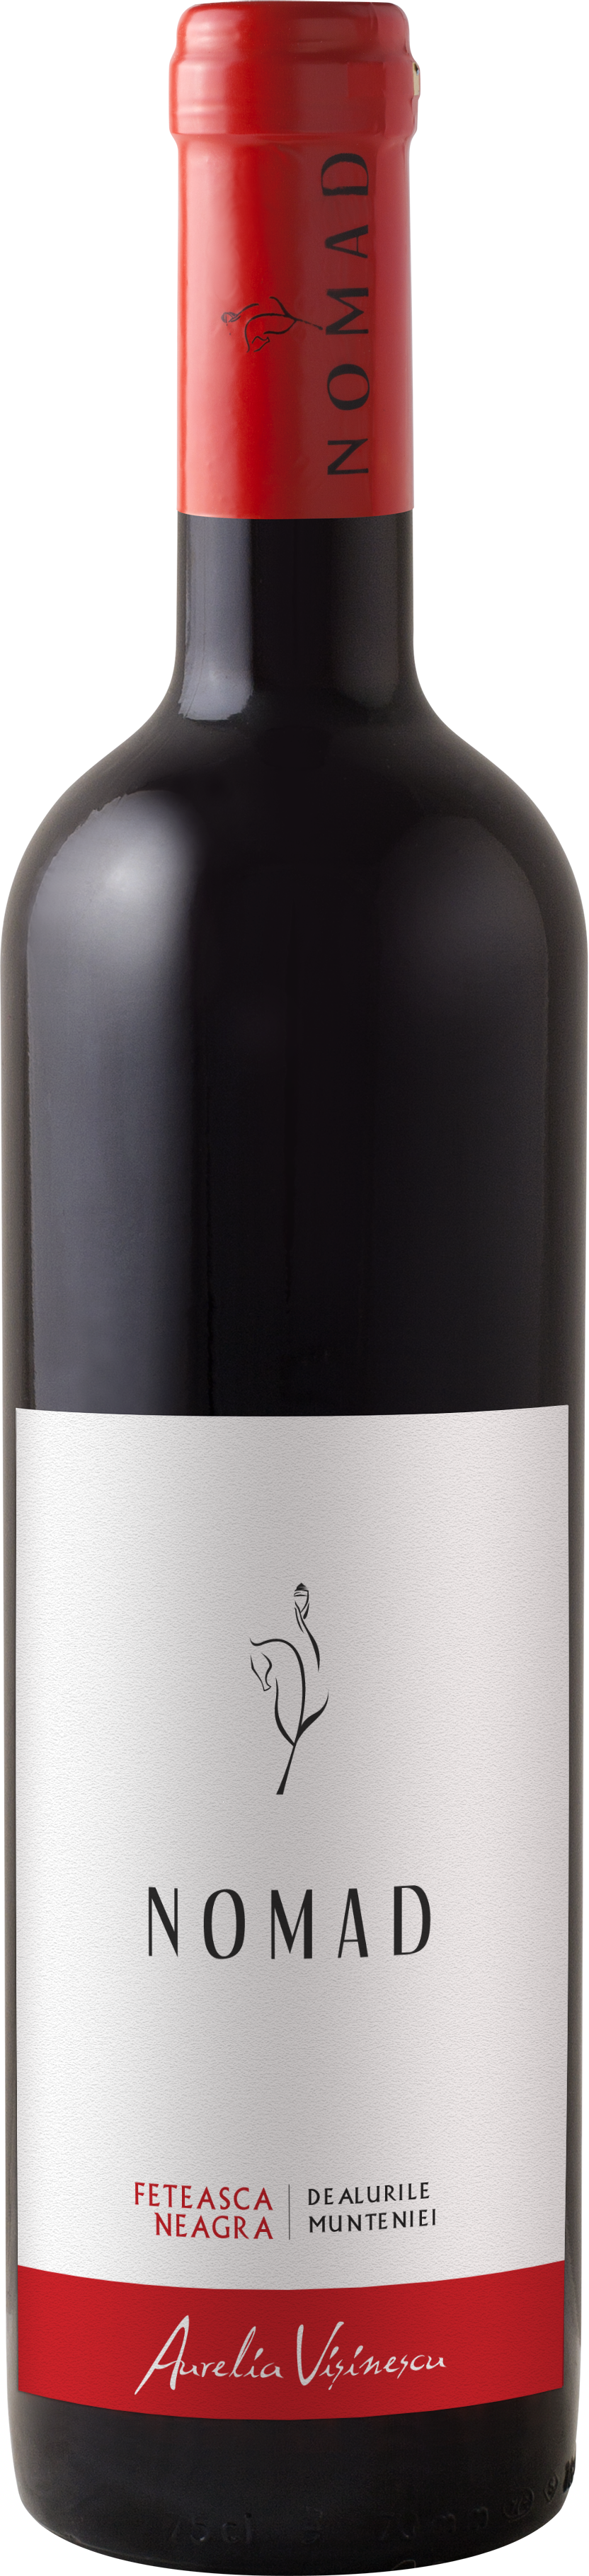 Vin rosu - Aurelia Visinescu / Nomad, Feteasca Neagra, 2015, sec Aurelia Visinescu